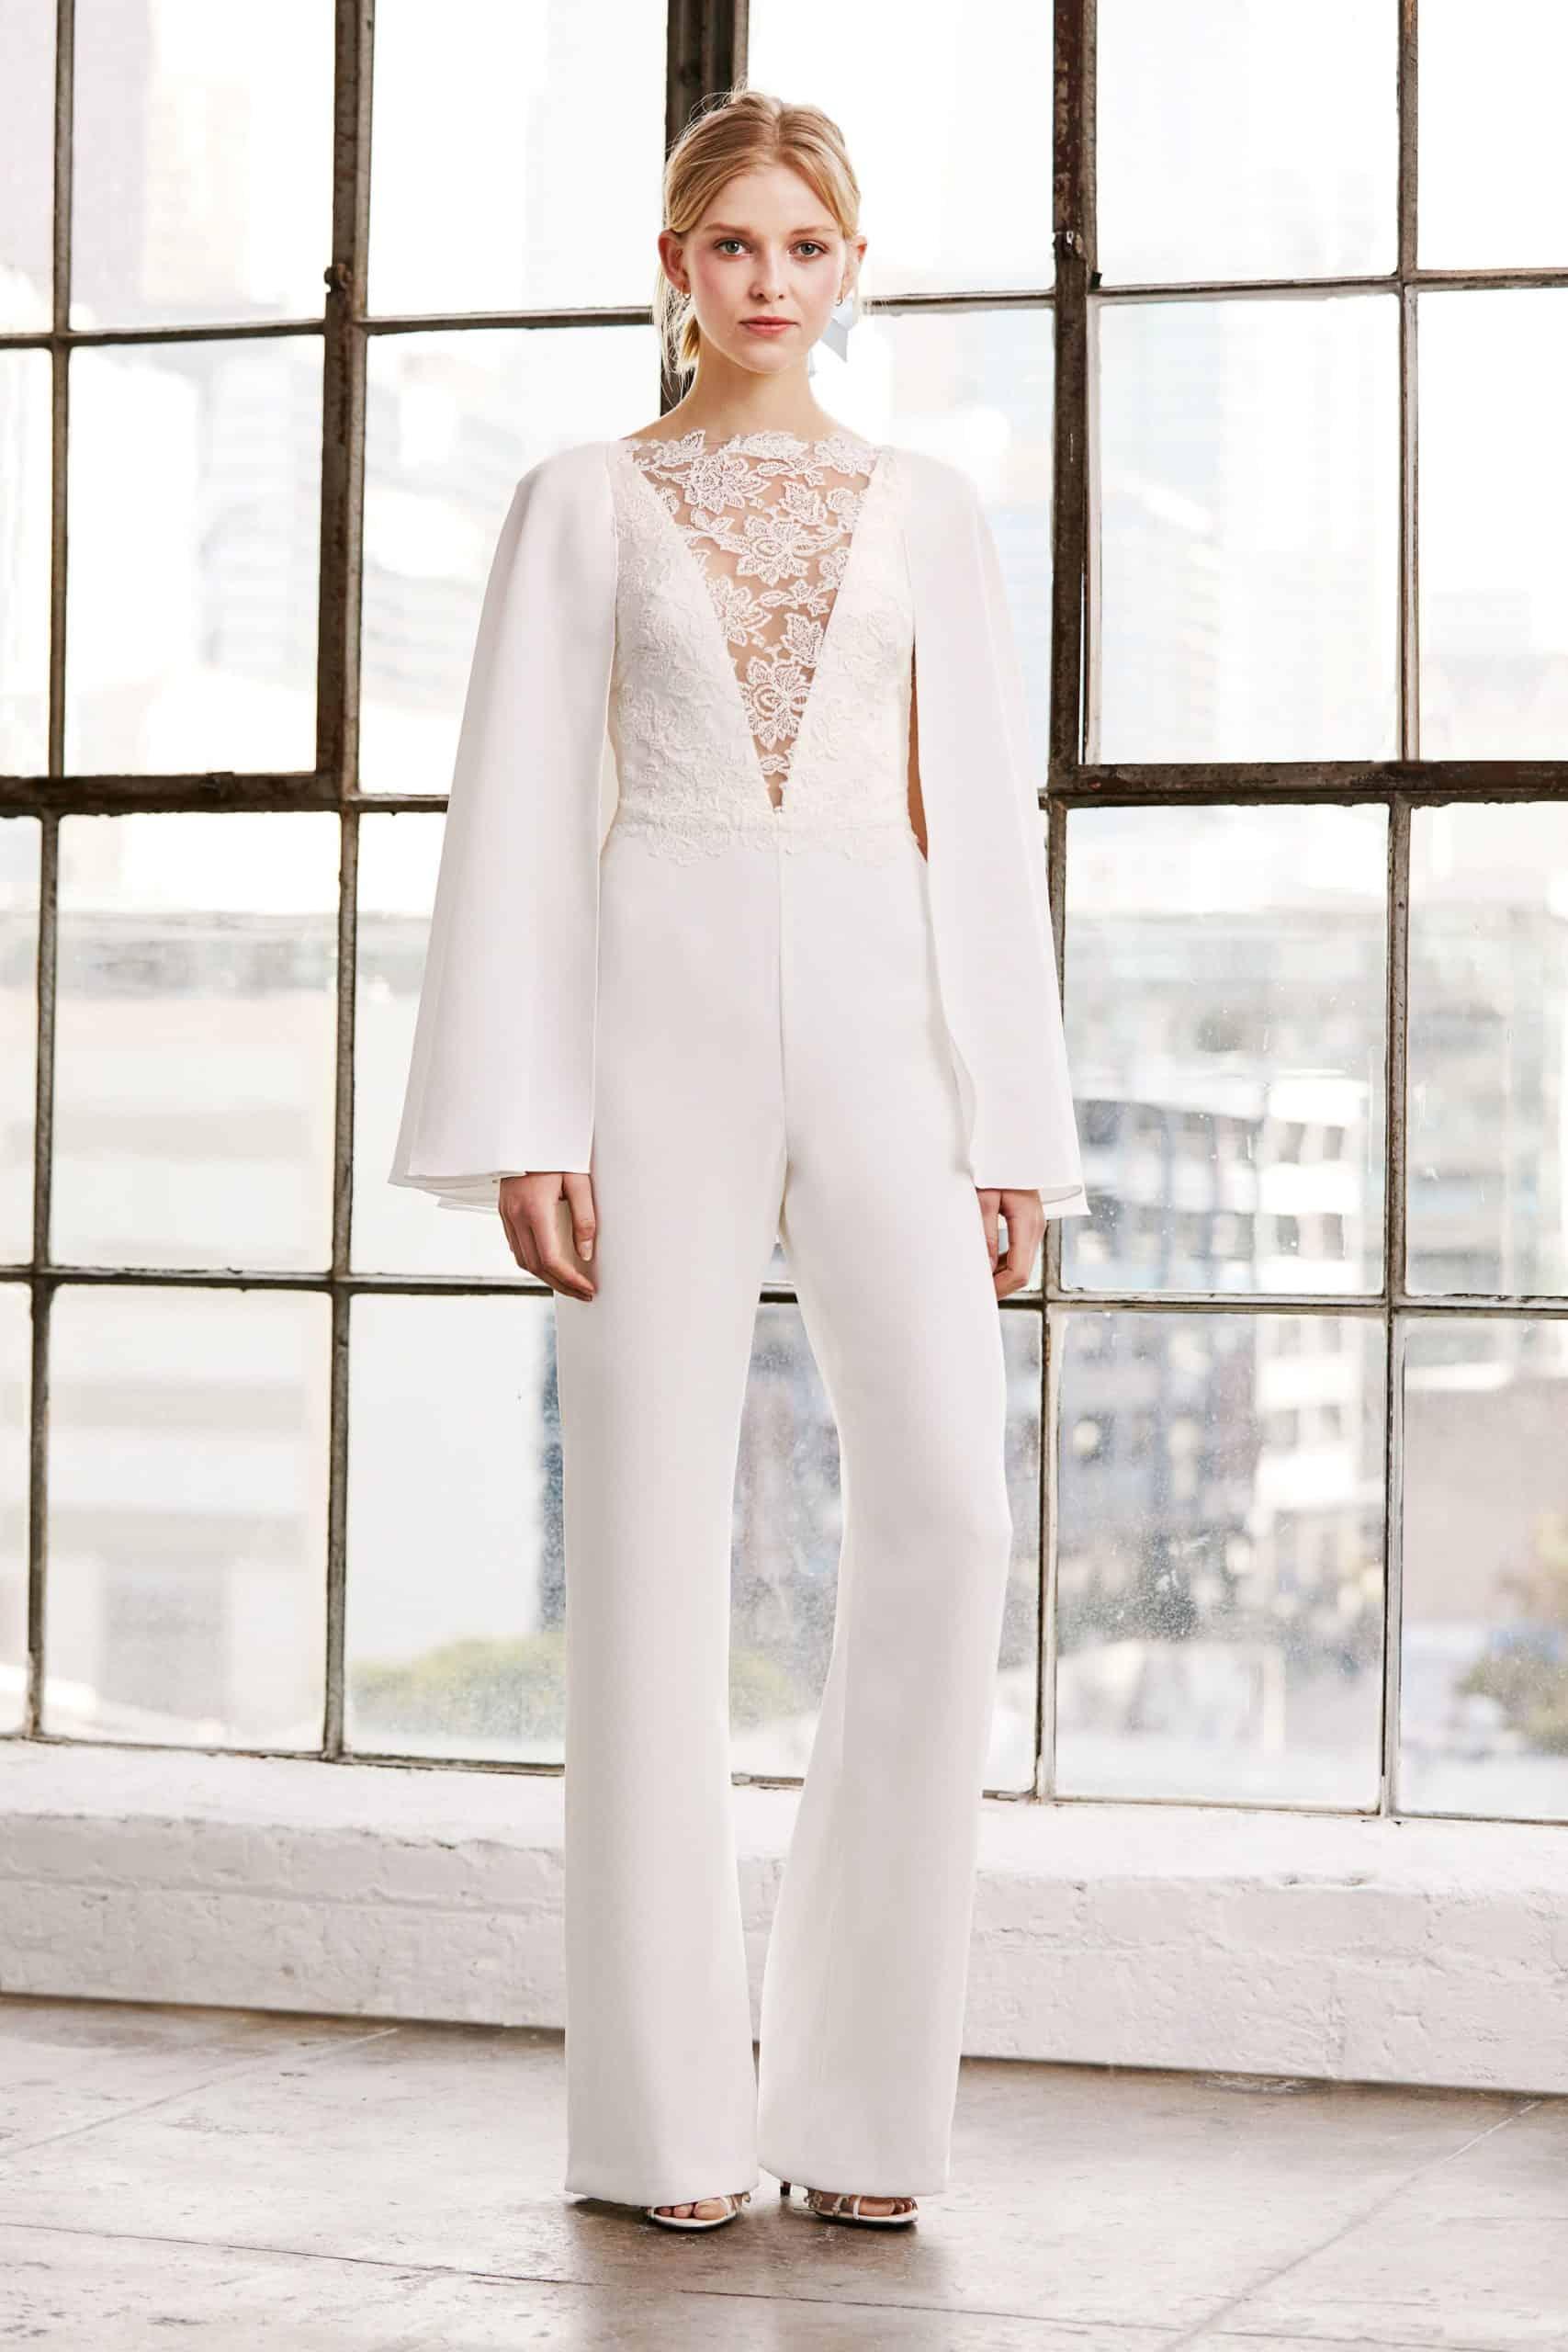 jumpsuit wedding dress with a V-neck lace by Tadashi Shoji